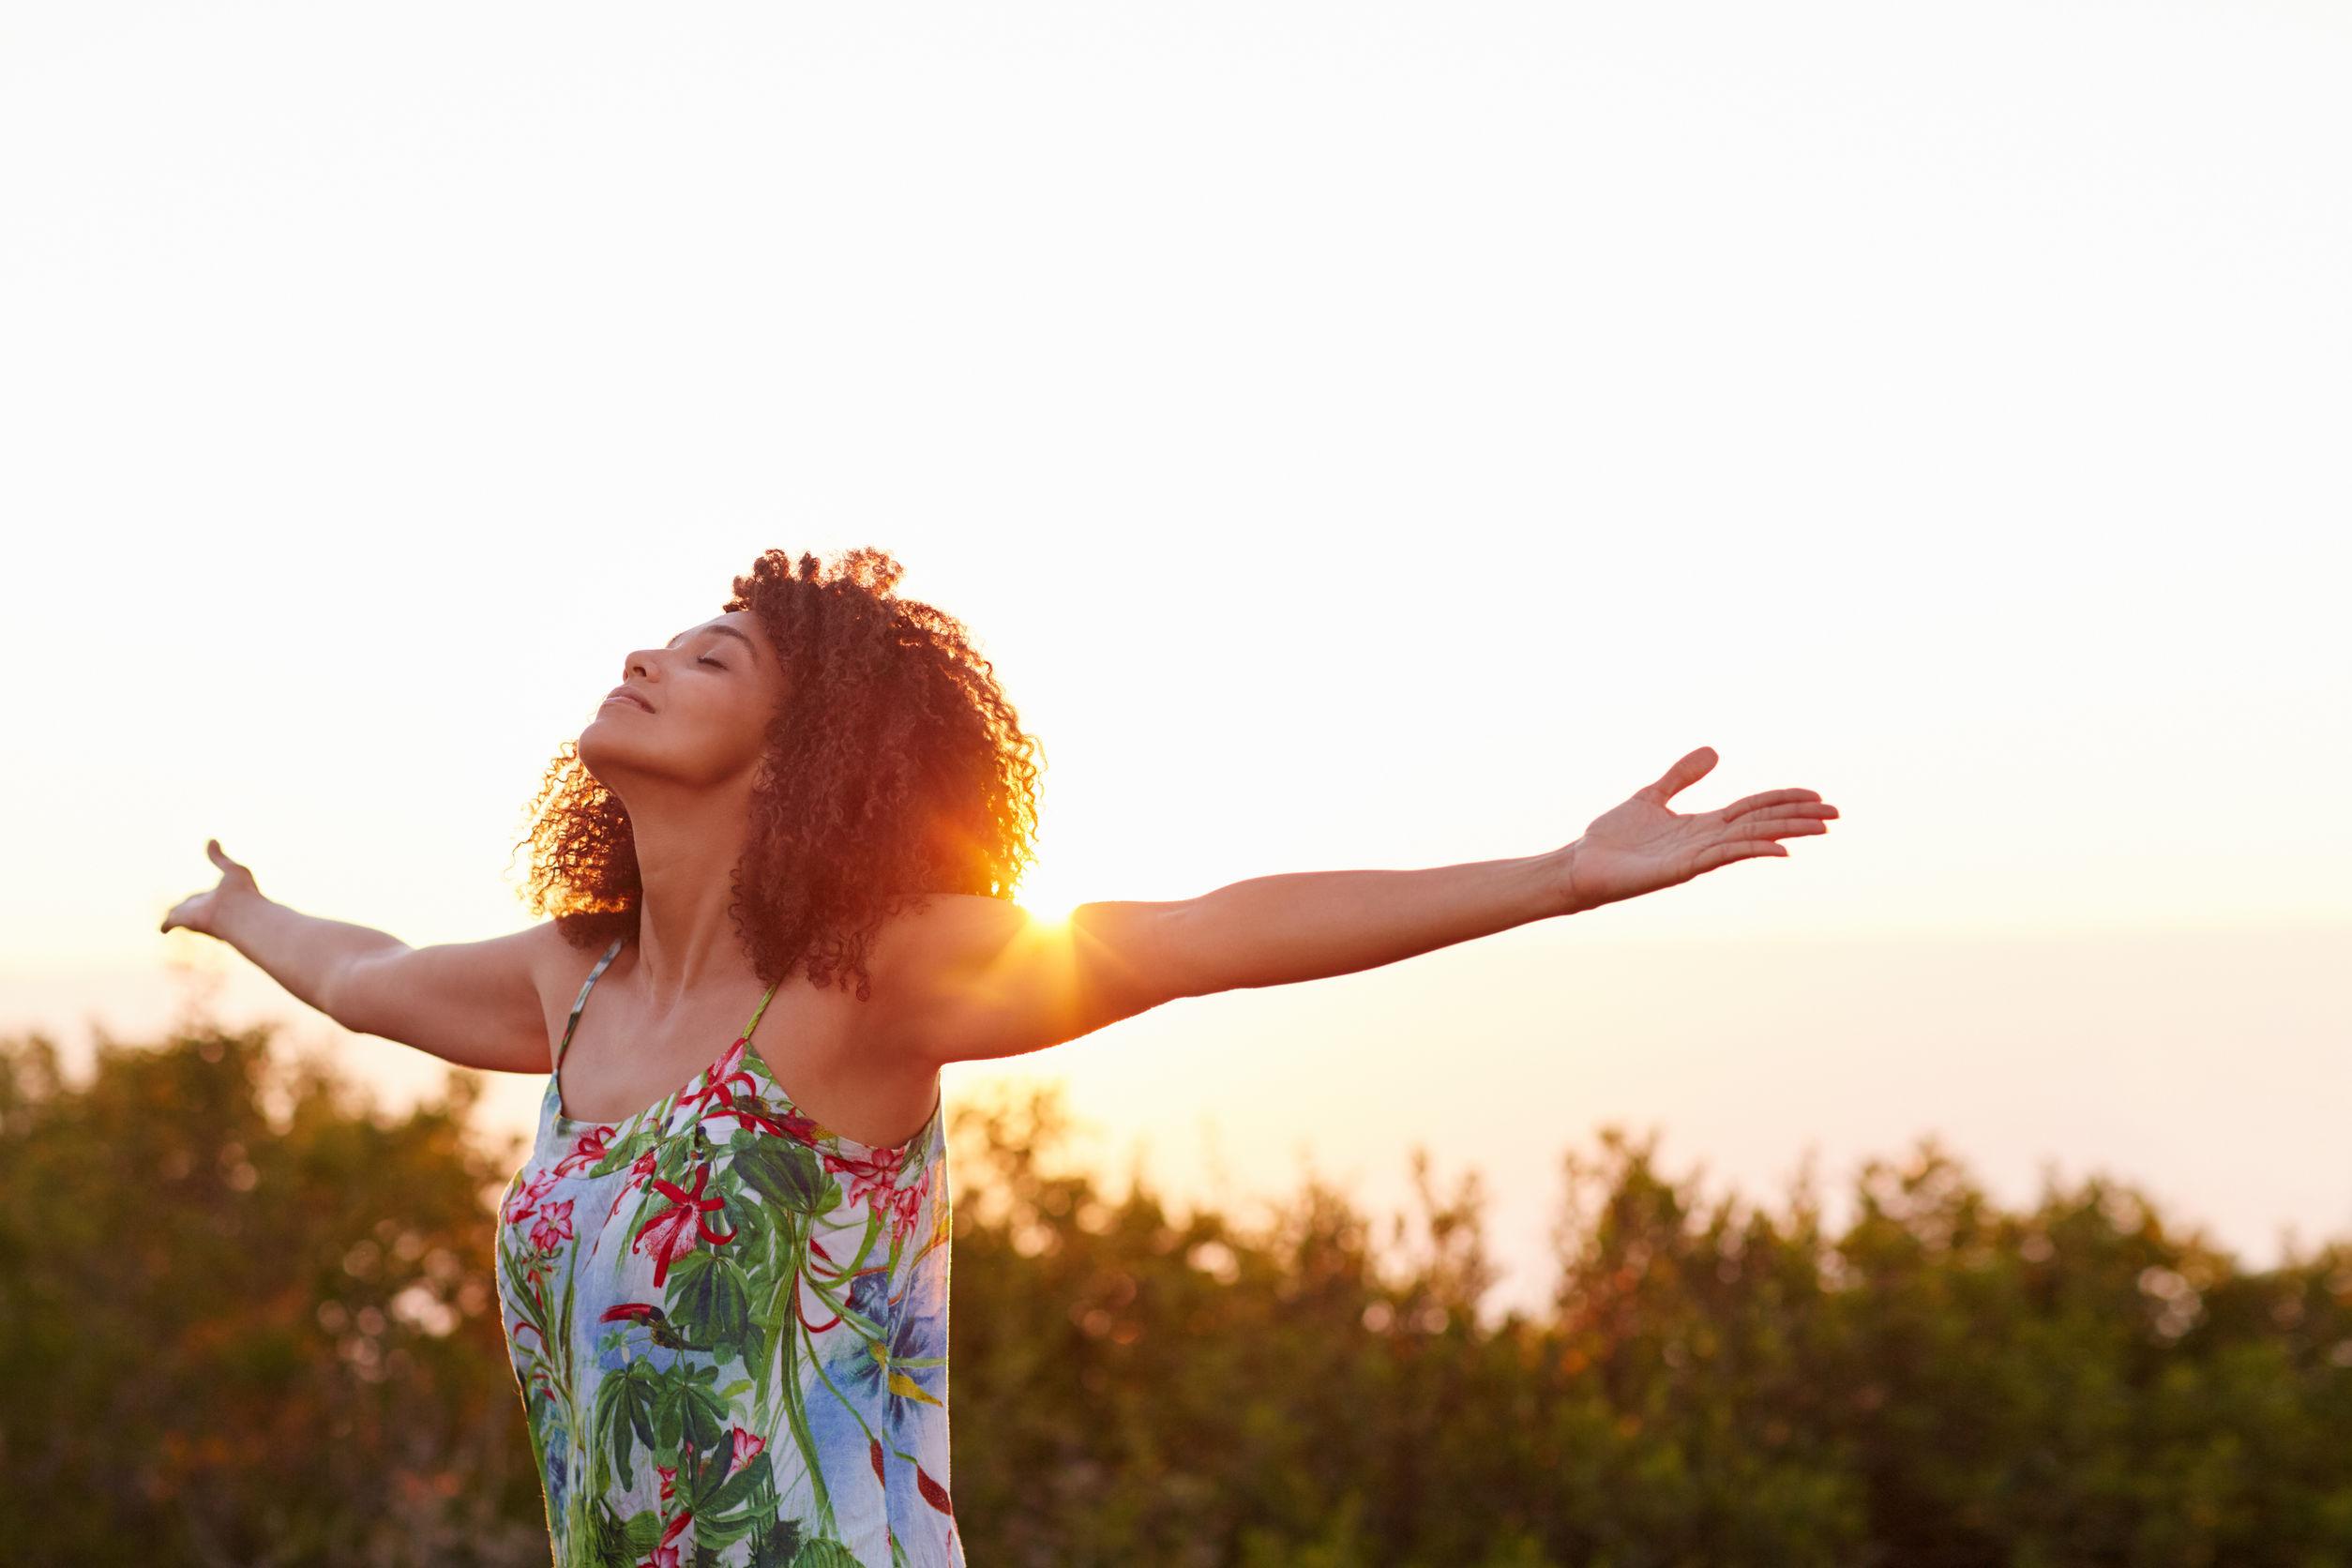 The Practice of Gratitude